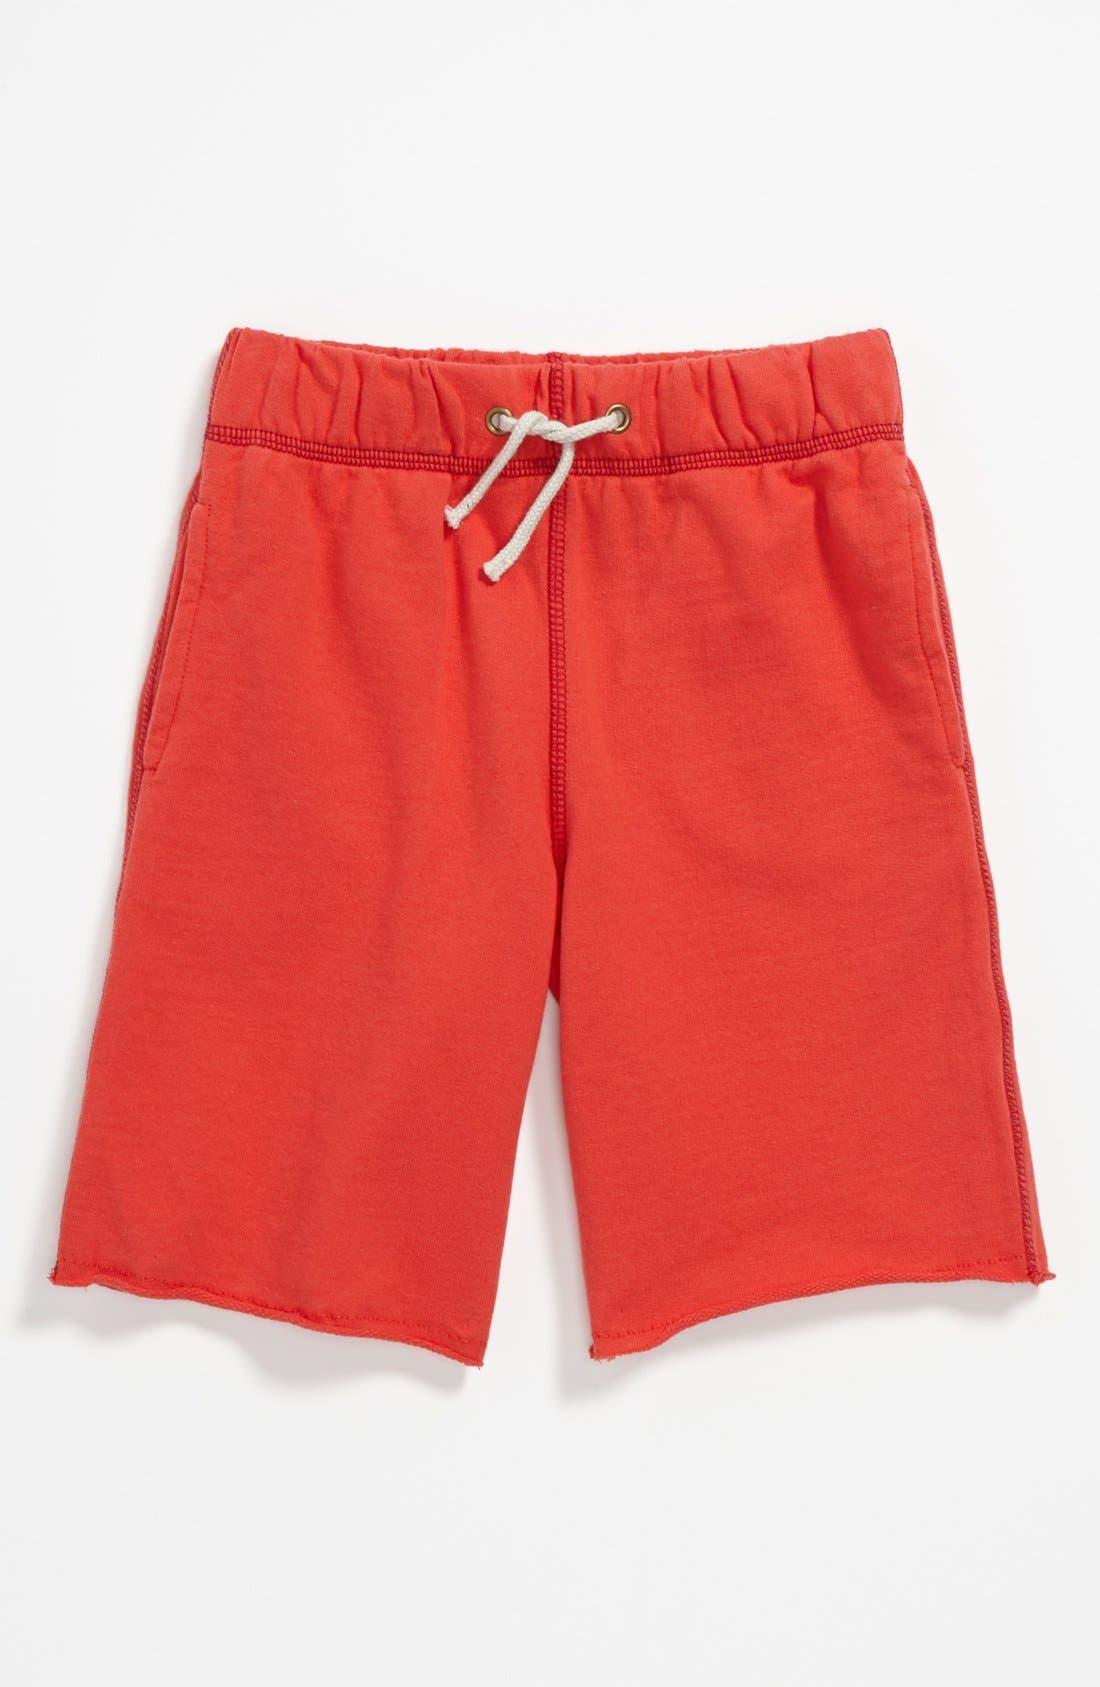 Alternate Image 1 Selected - Appaman 'Camp' Shorts (Toddler)